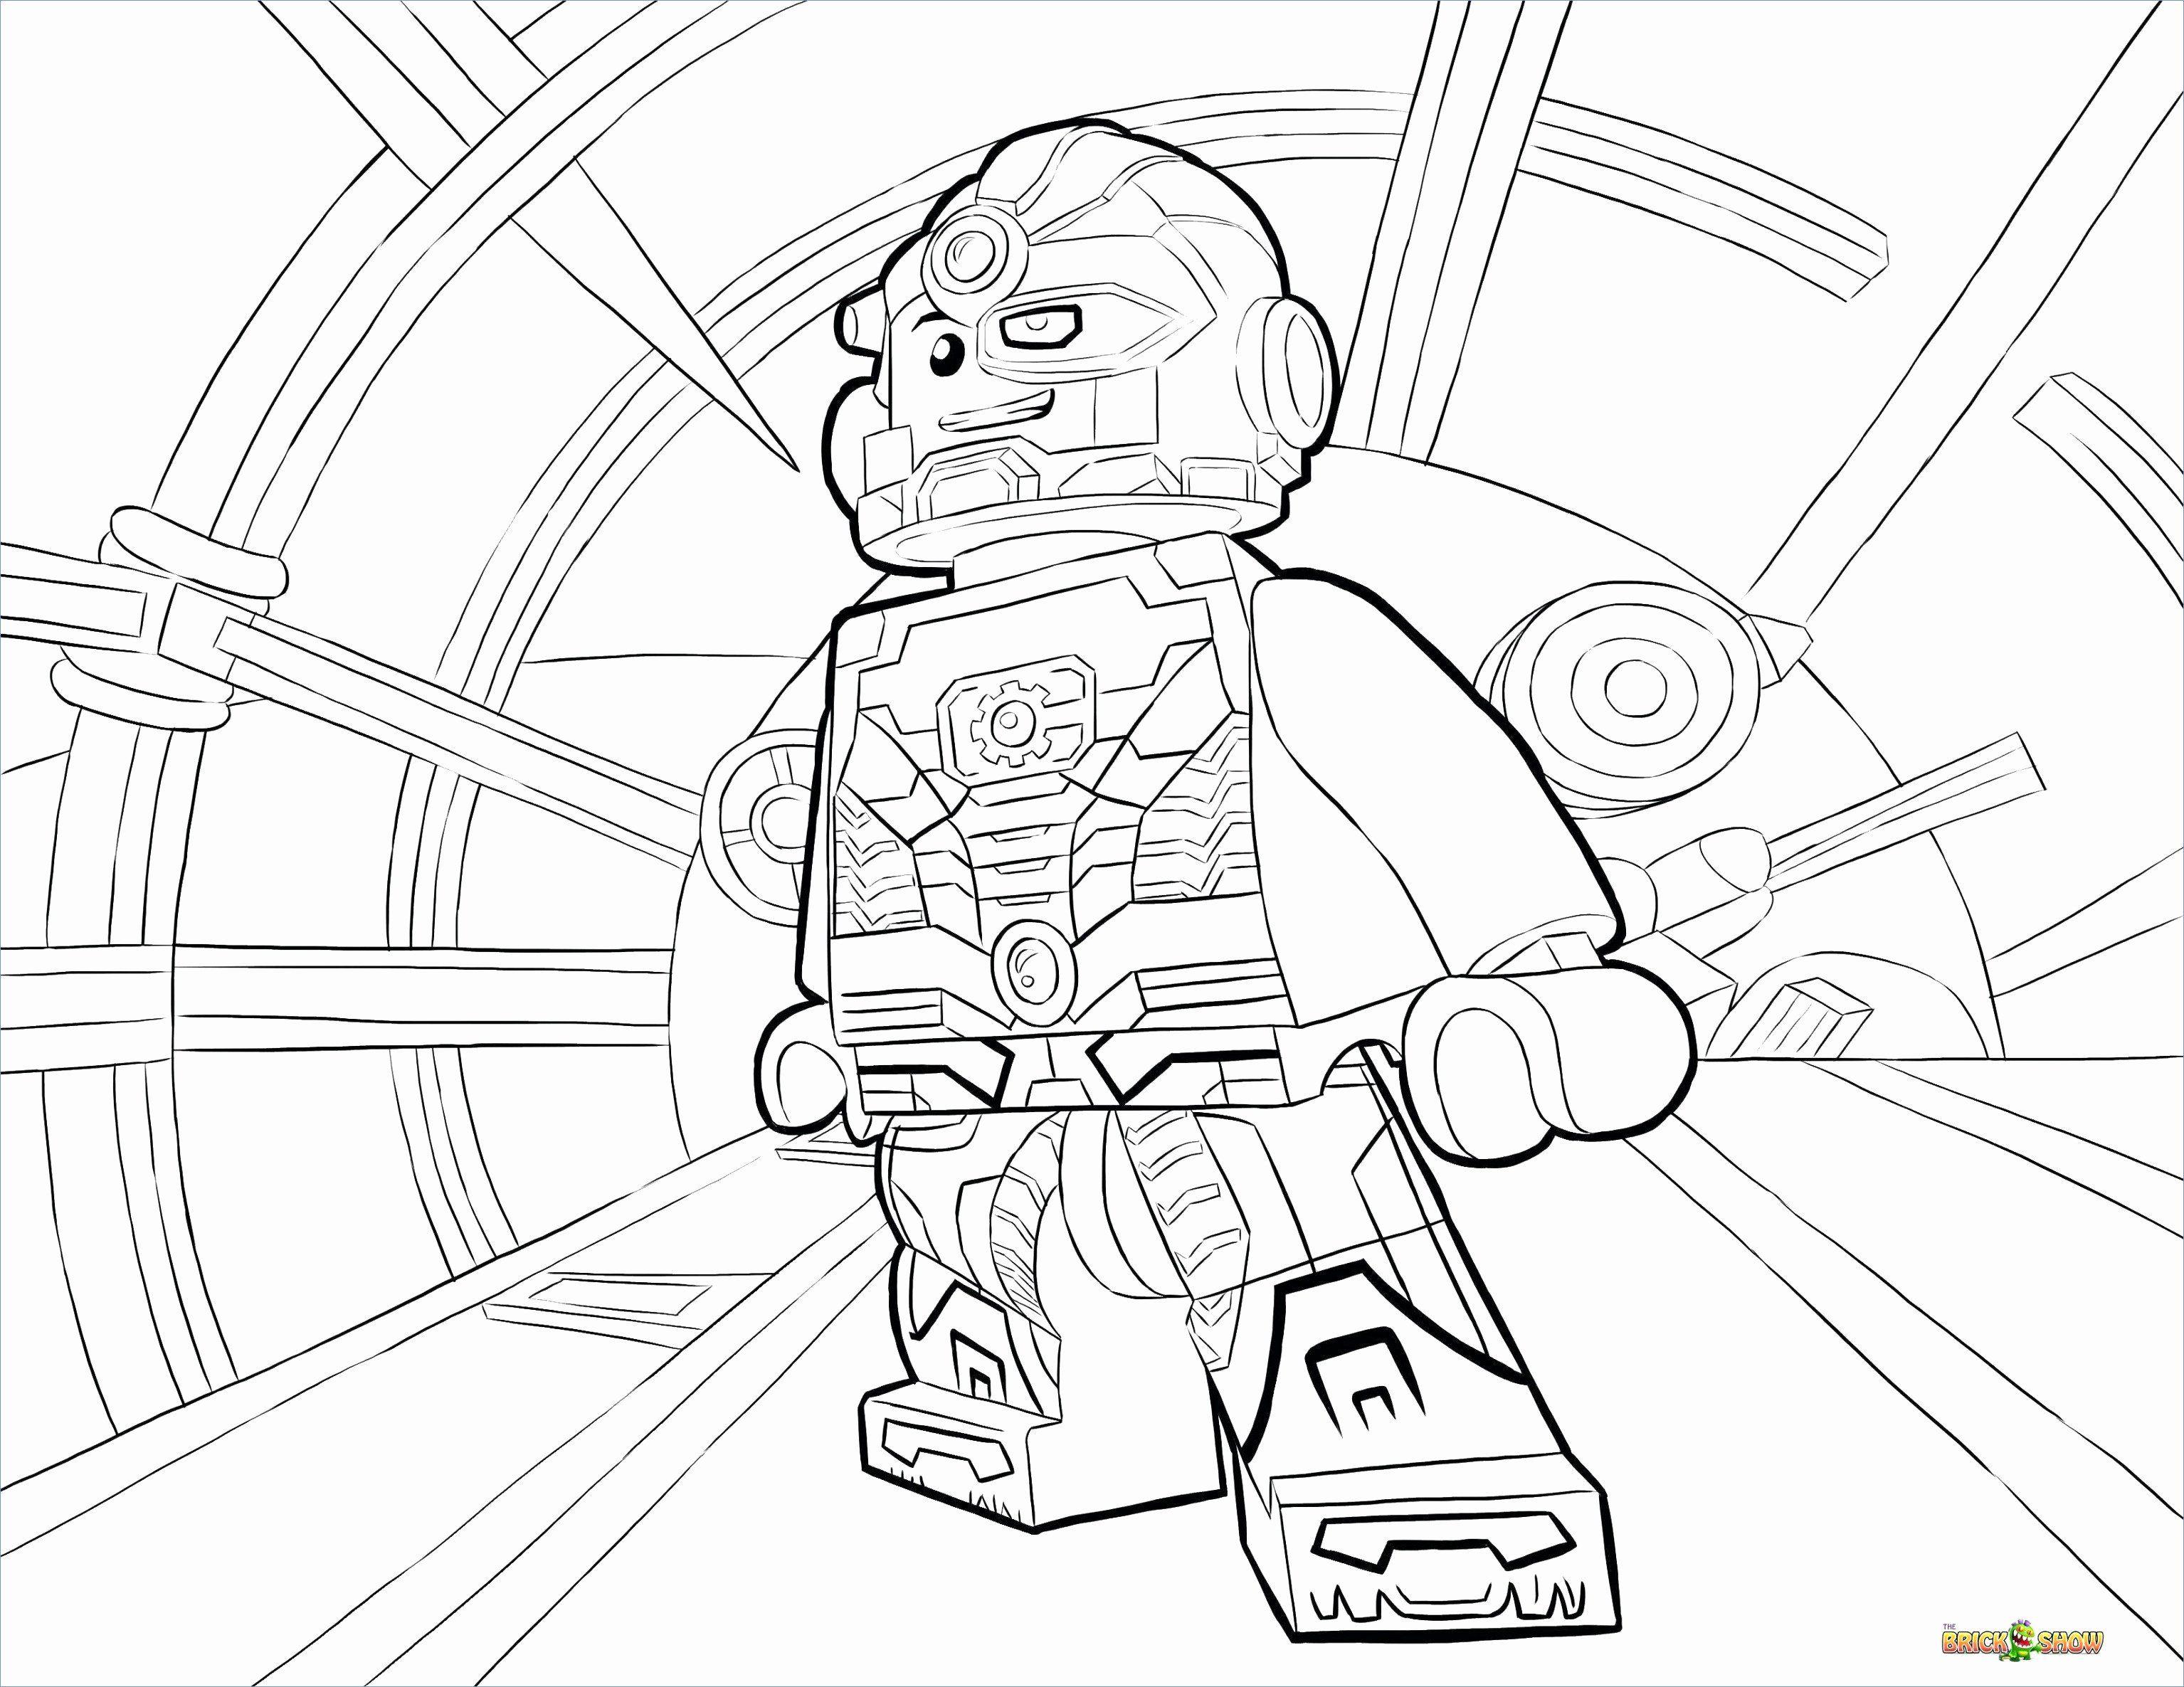 Kid Superhero Coloring Pages Unique Lego Superhero ...